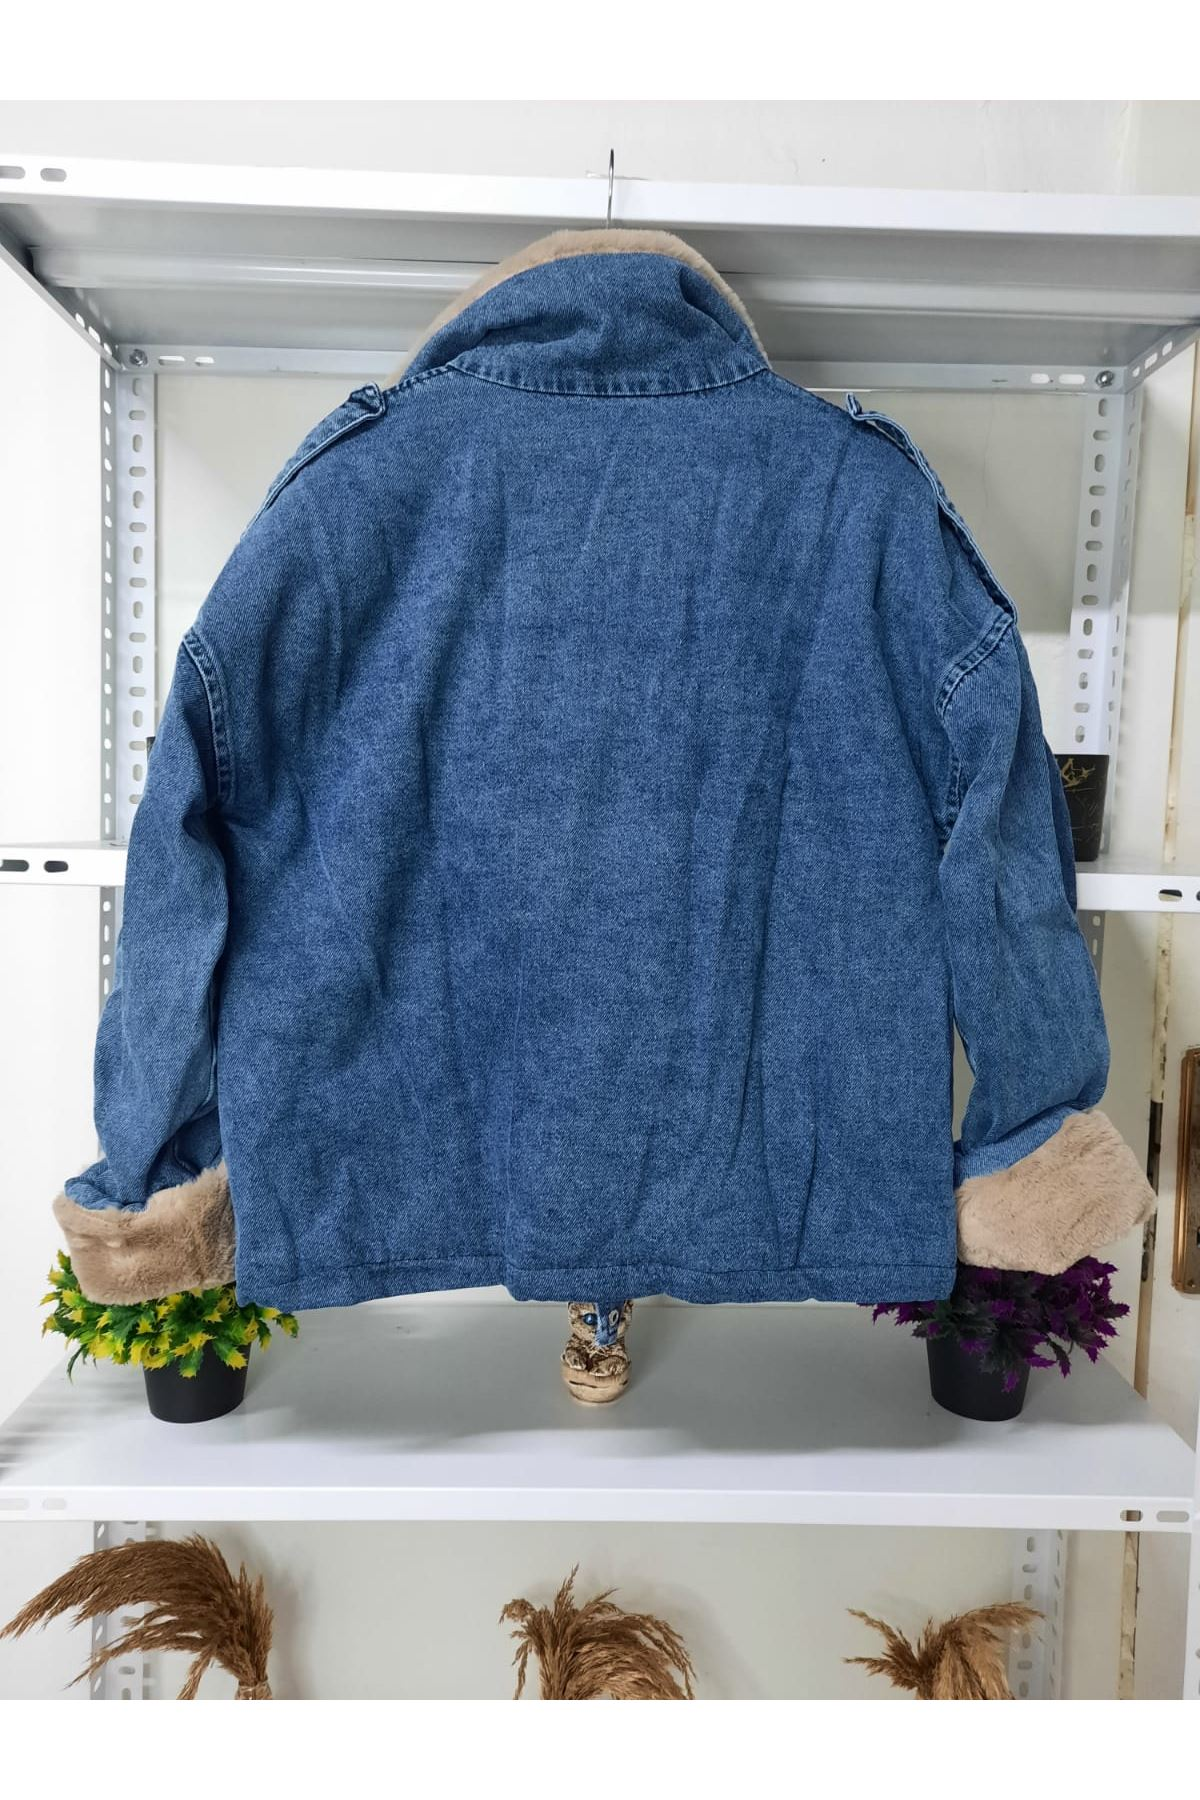 Kuzu Peluşlu Kot Ceket - ekru